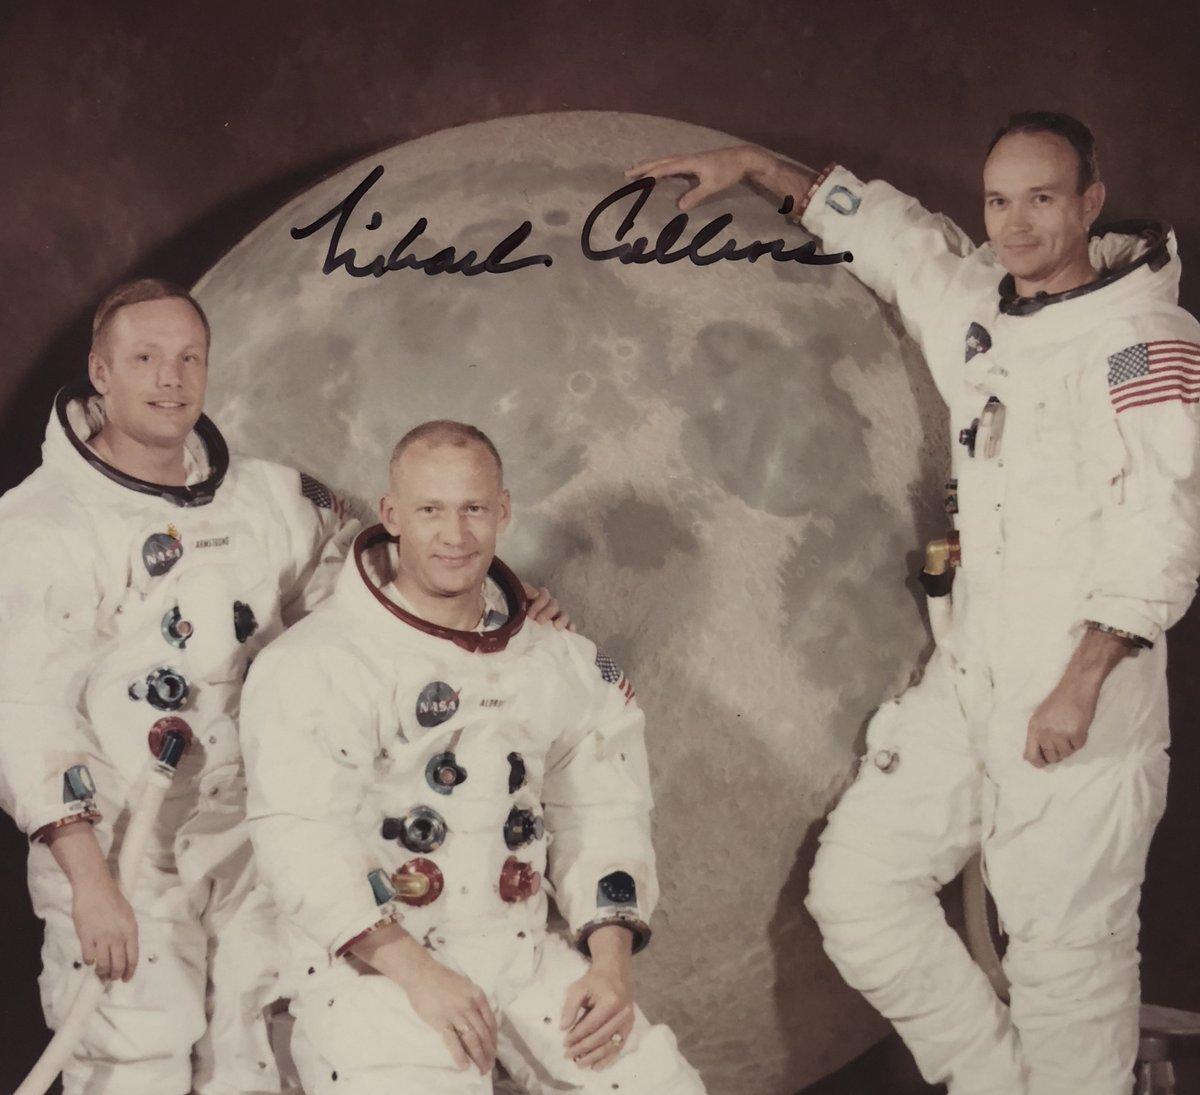 Аполлон 11 / Twitter/Michael Collins